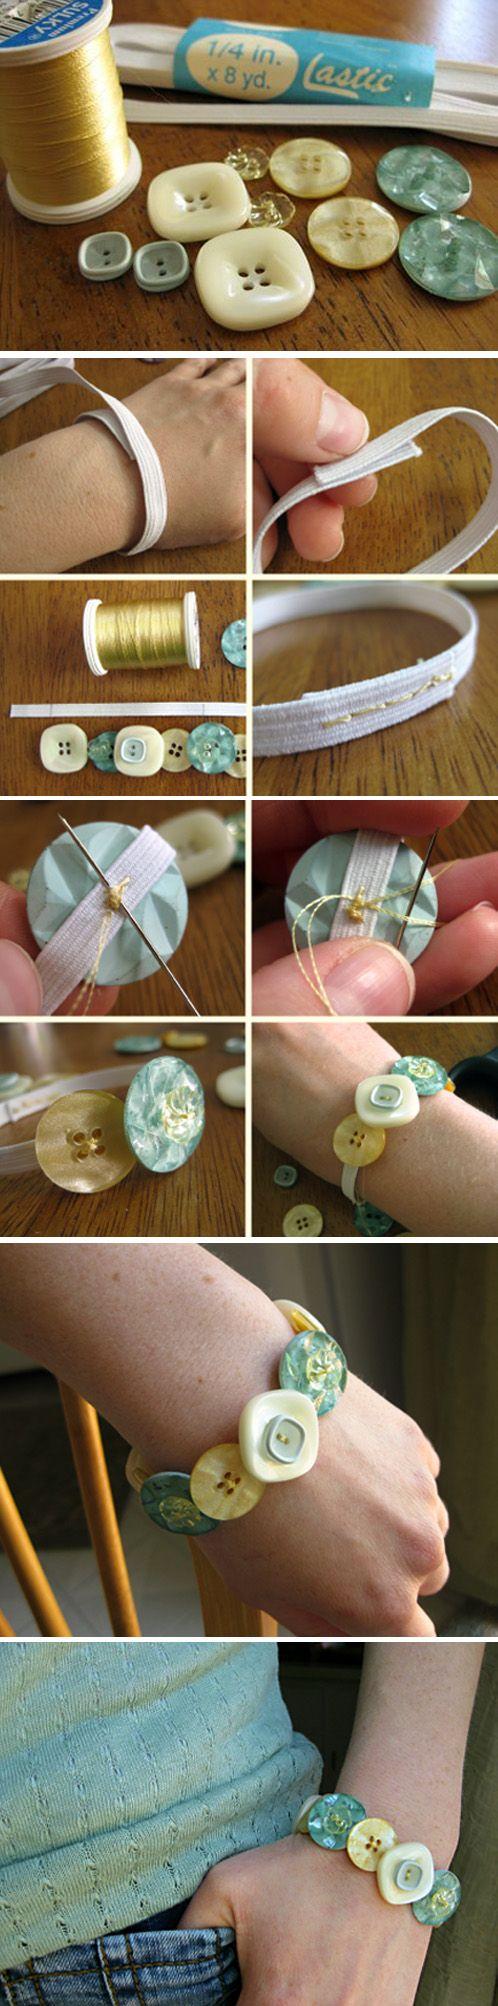 Sencilla pulsera DIY con botones de diferentes tamaños bracelet élastique avec des boutons ! simple et joli !